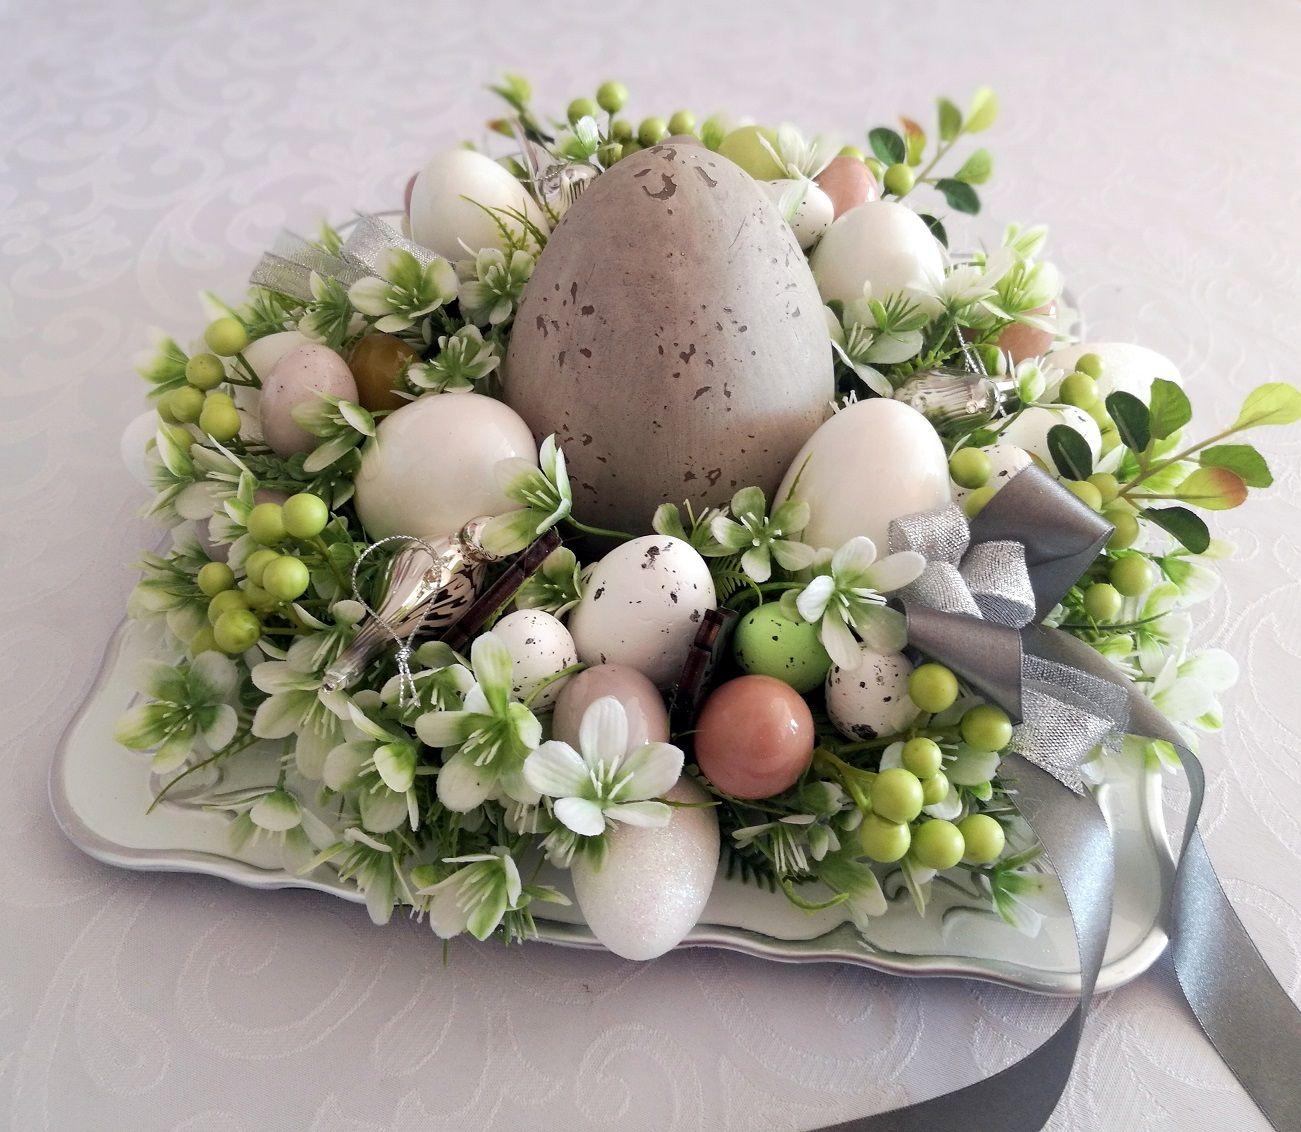 Wielkanocny Wianek Wiosenna Mgla Nr 77 Swiateczne Atelier Easter Centerpieces Easter Diy Easter 2020